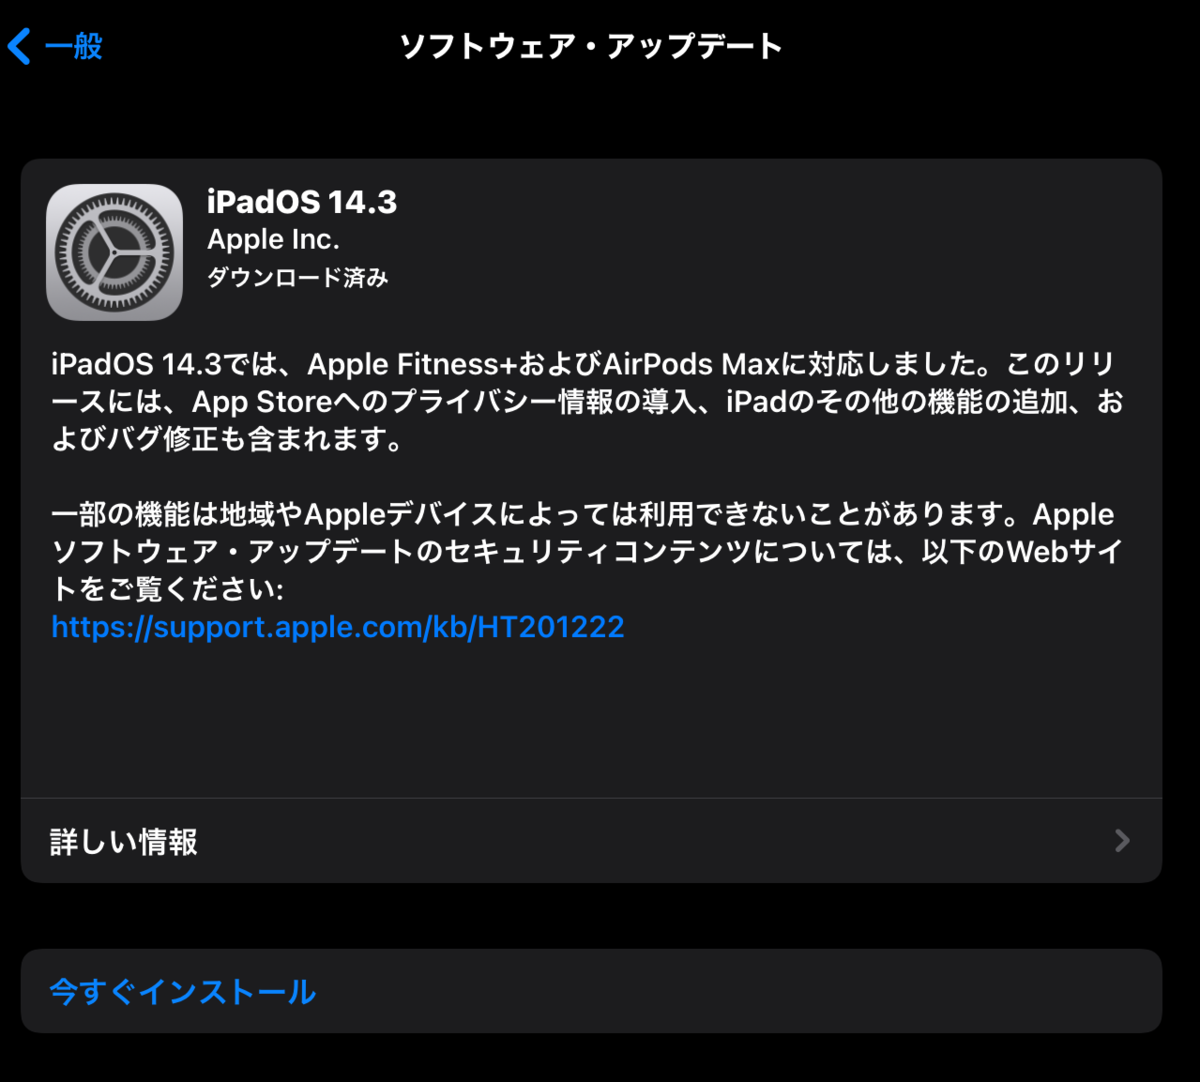 f:id:anotherdirection:20201216222400p:plain